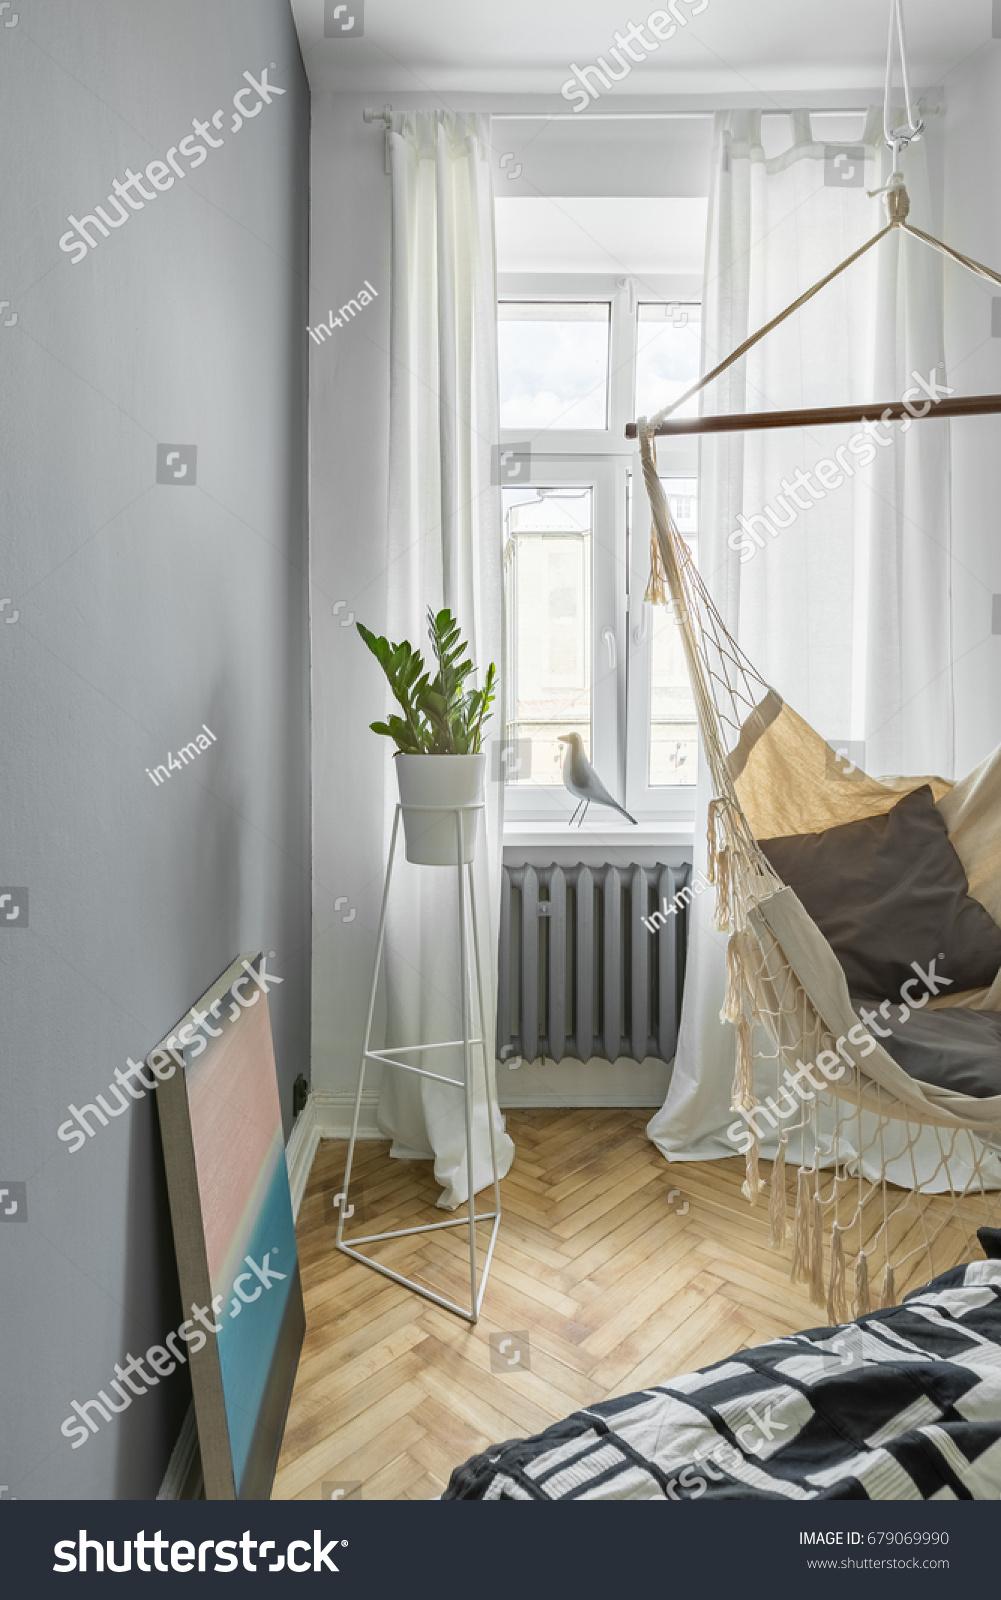 gray bedroom with diy hammock bed and window gray bedroom diy hammock bed window stock photo 679069990      rh   shutterstock